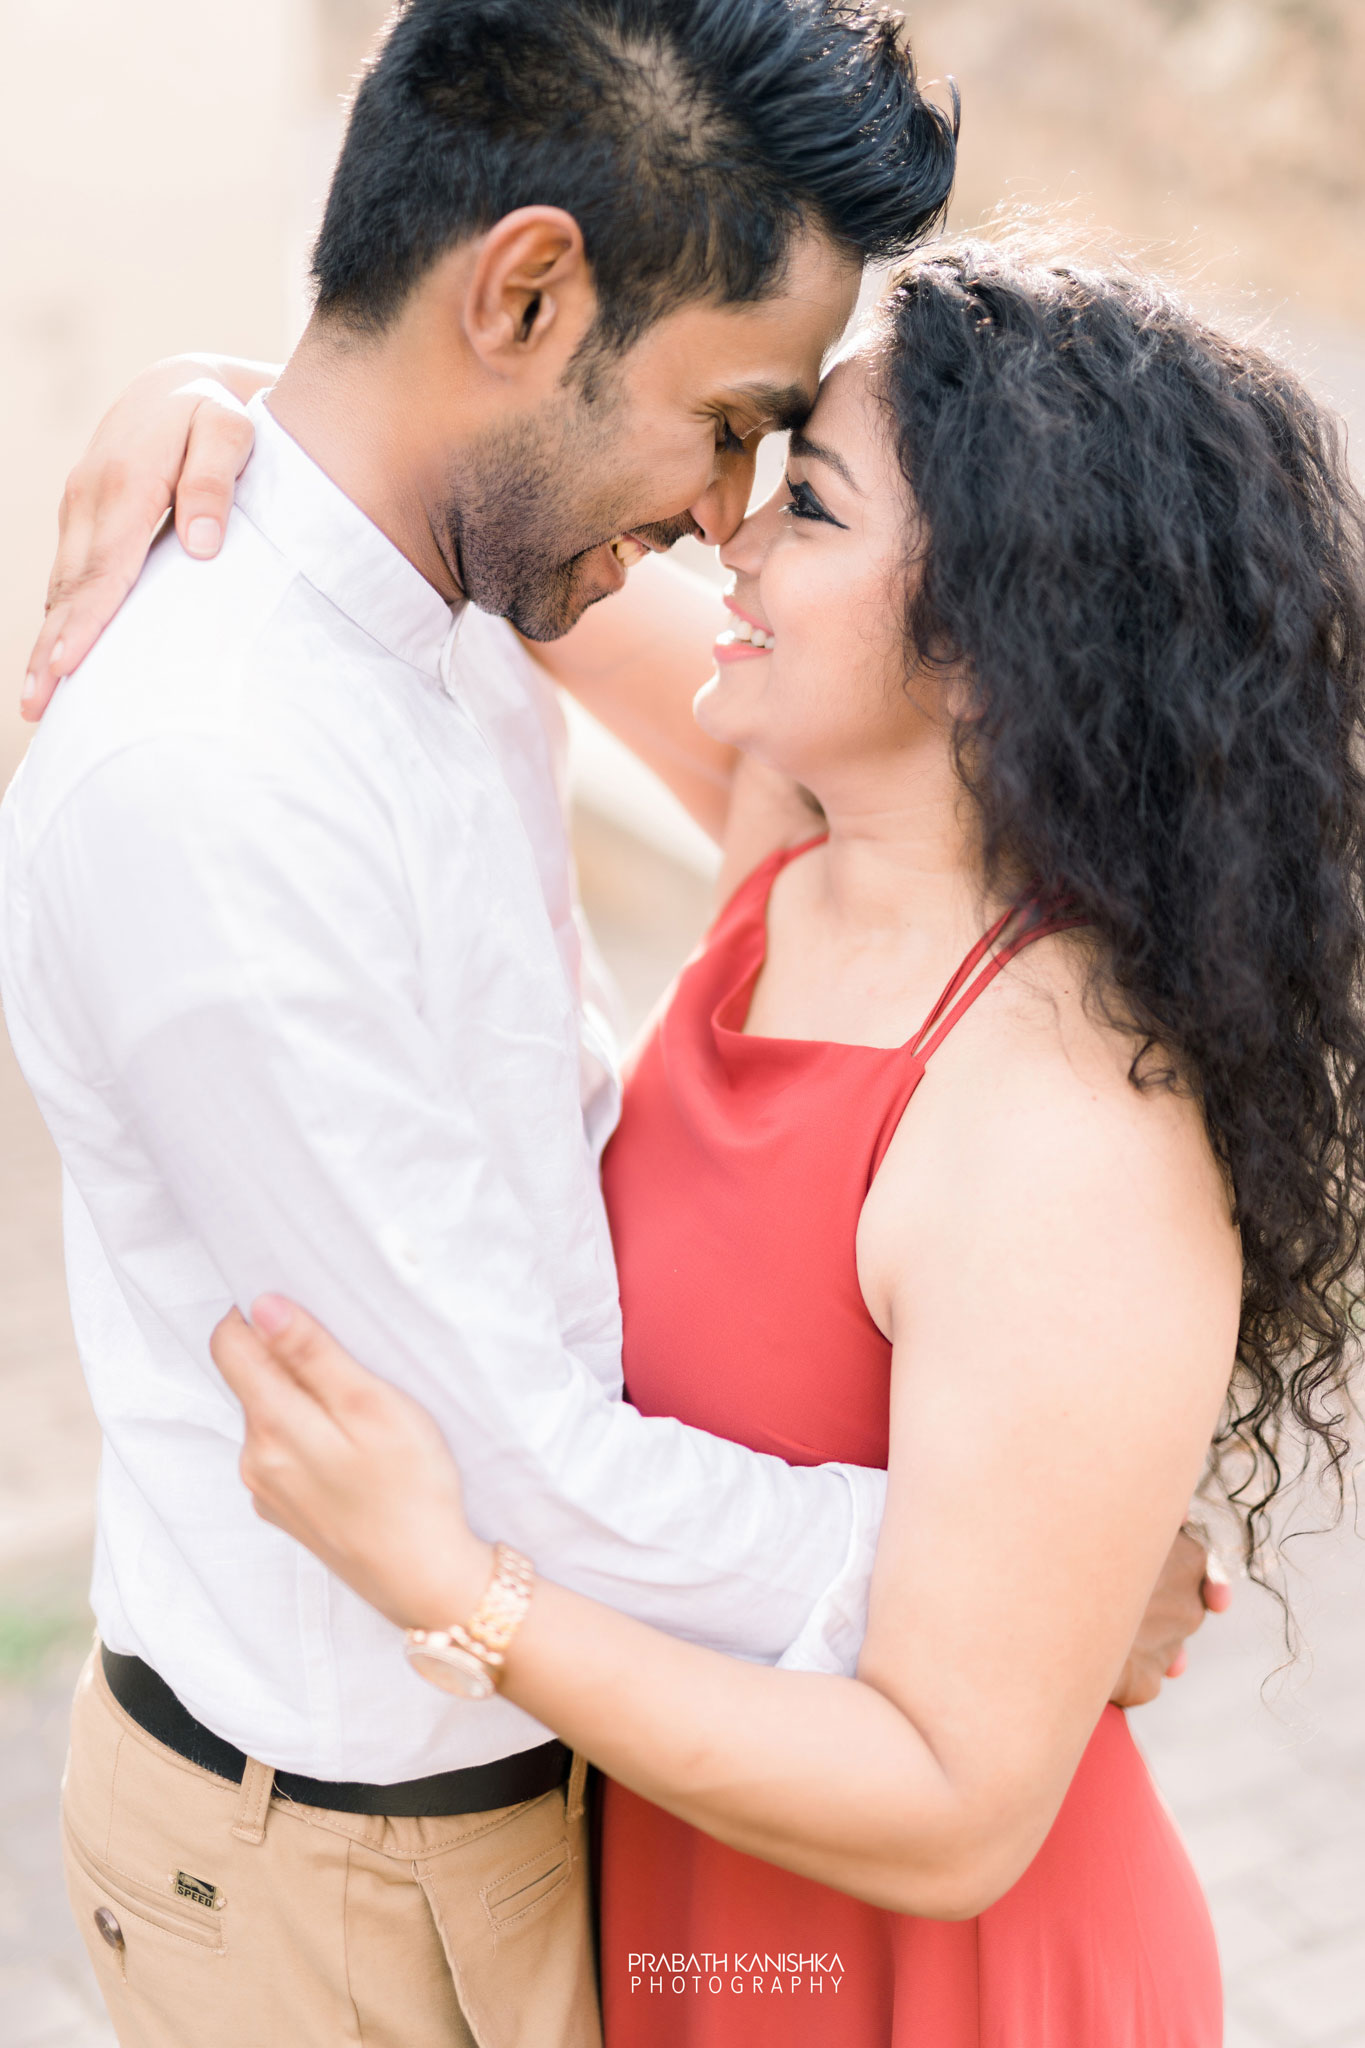 Melani & Shehan - Prabath Kanishka Wedding Photography